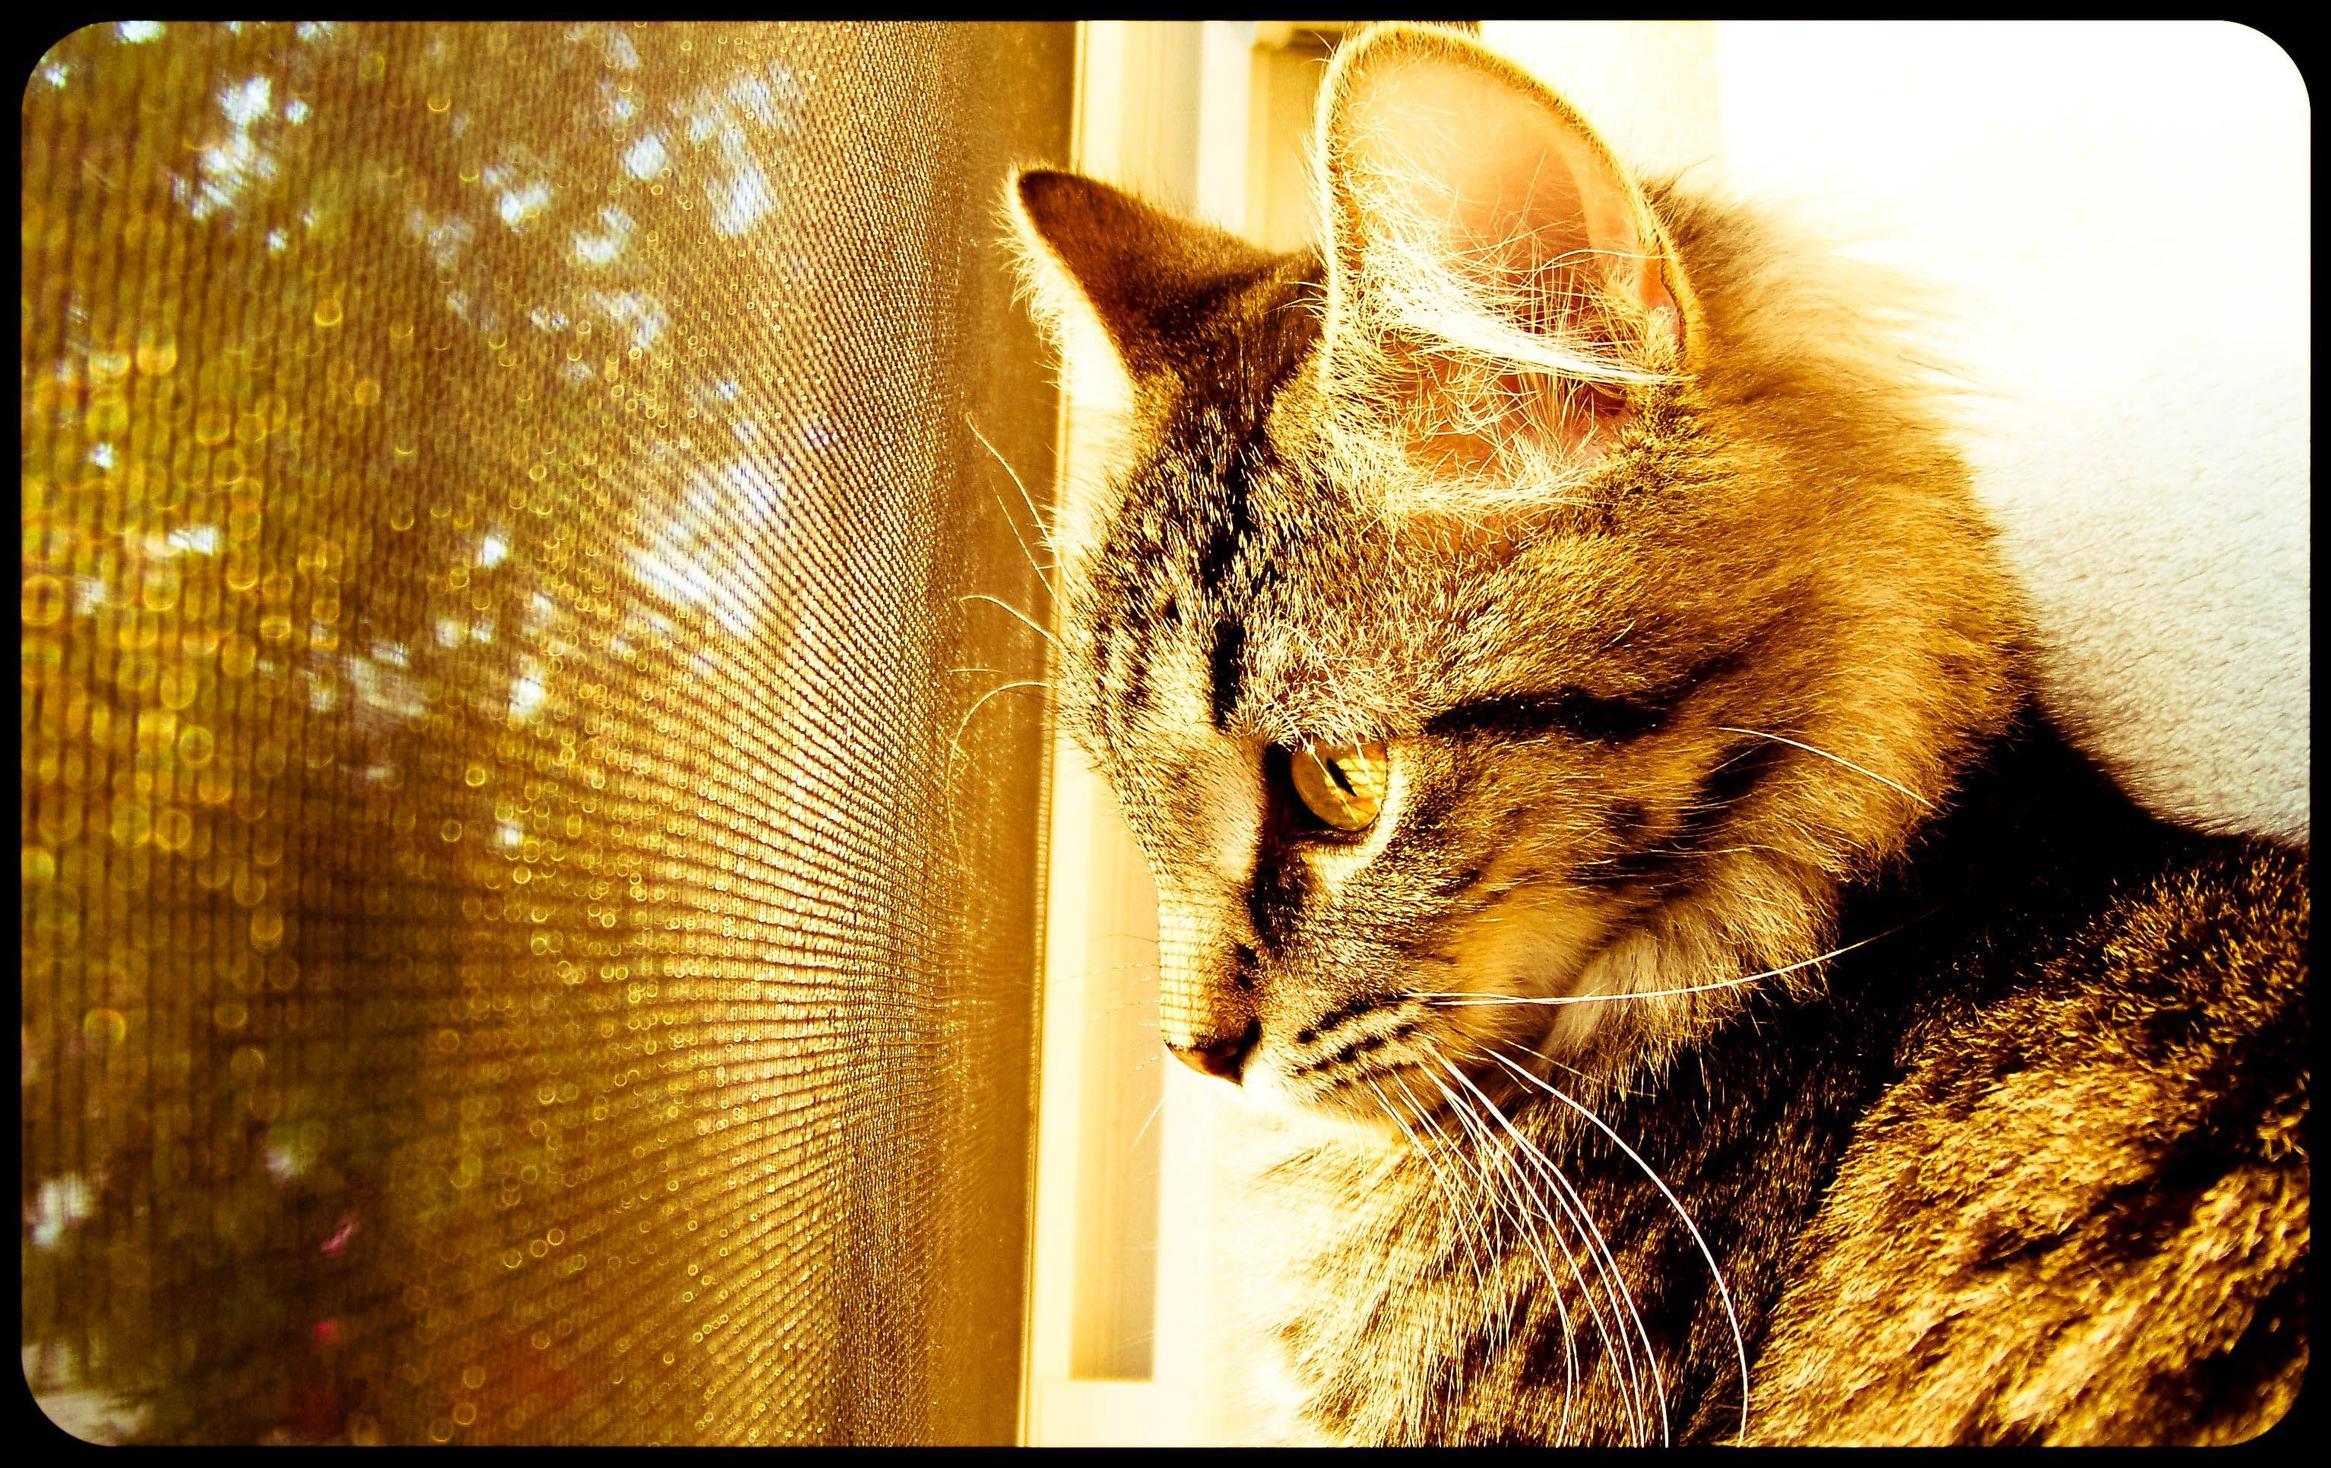 cat by the scren window wallpaper background 2331x1468